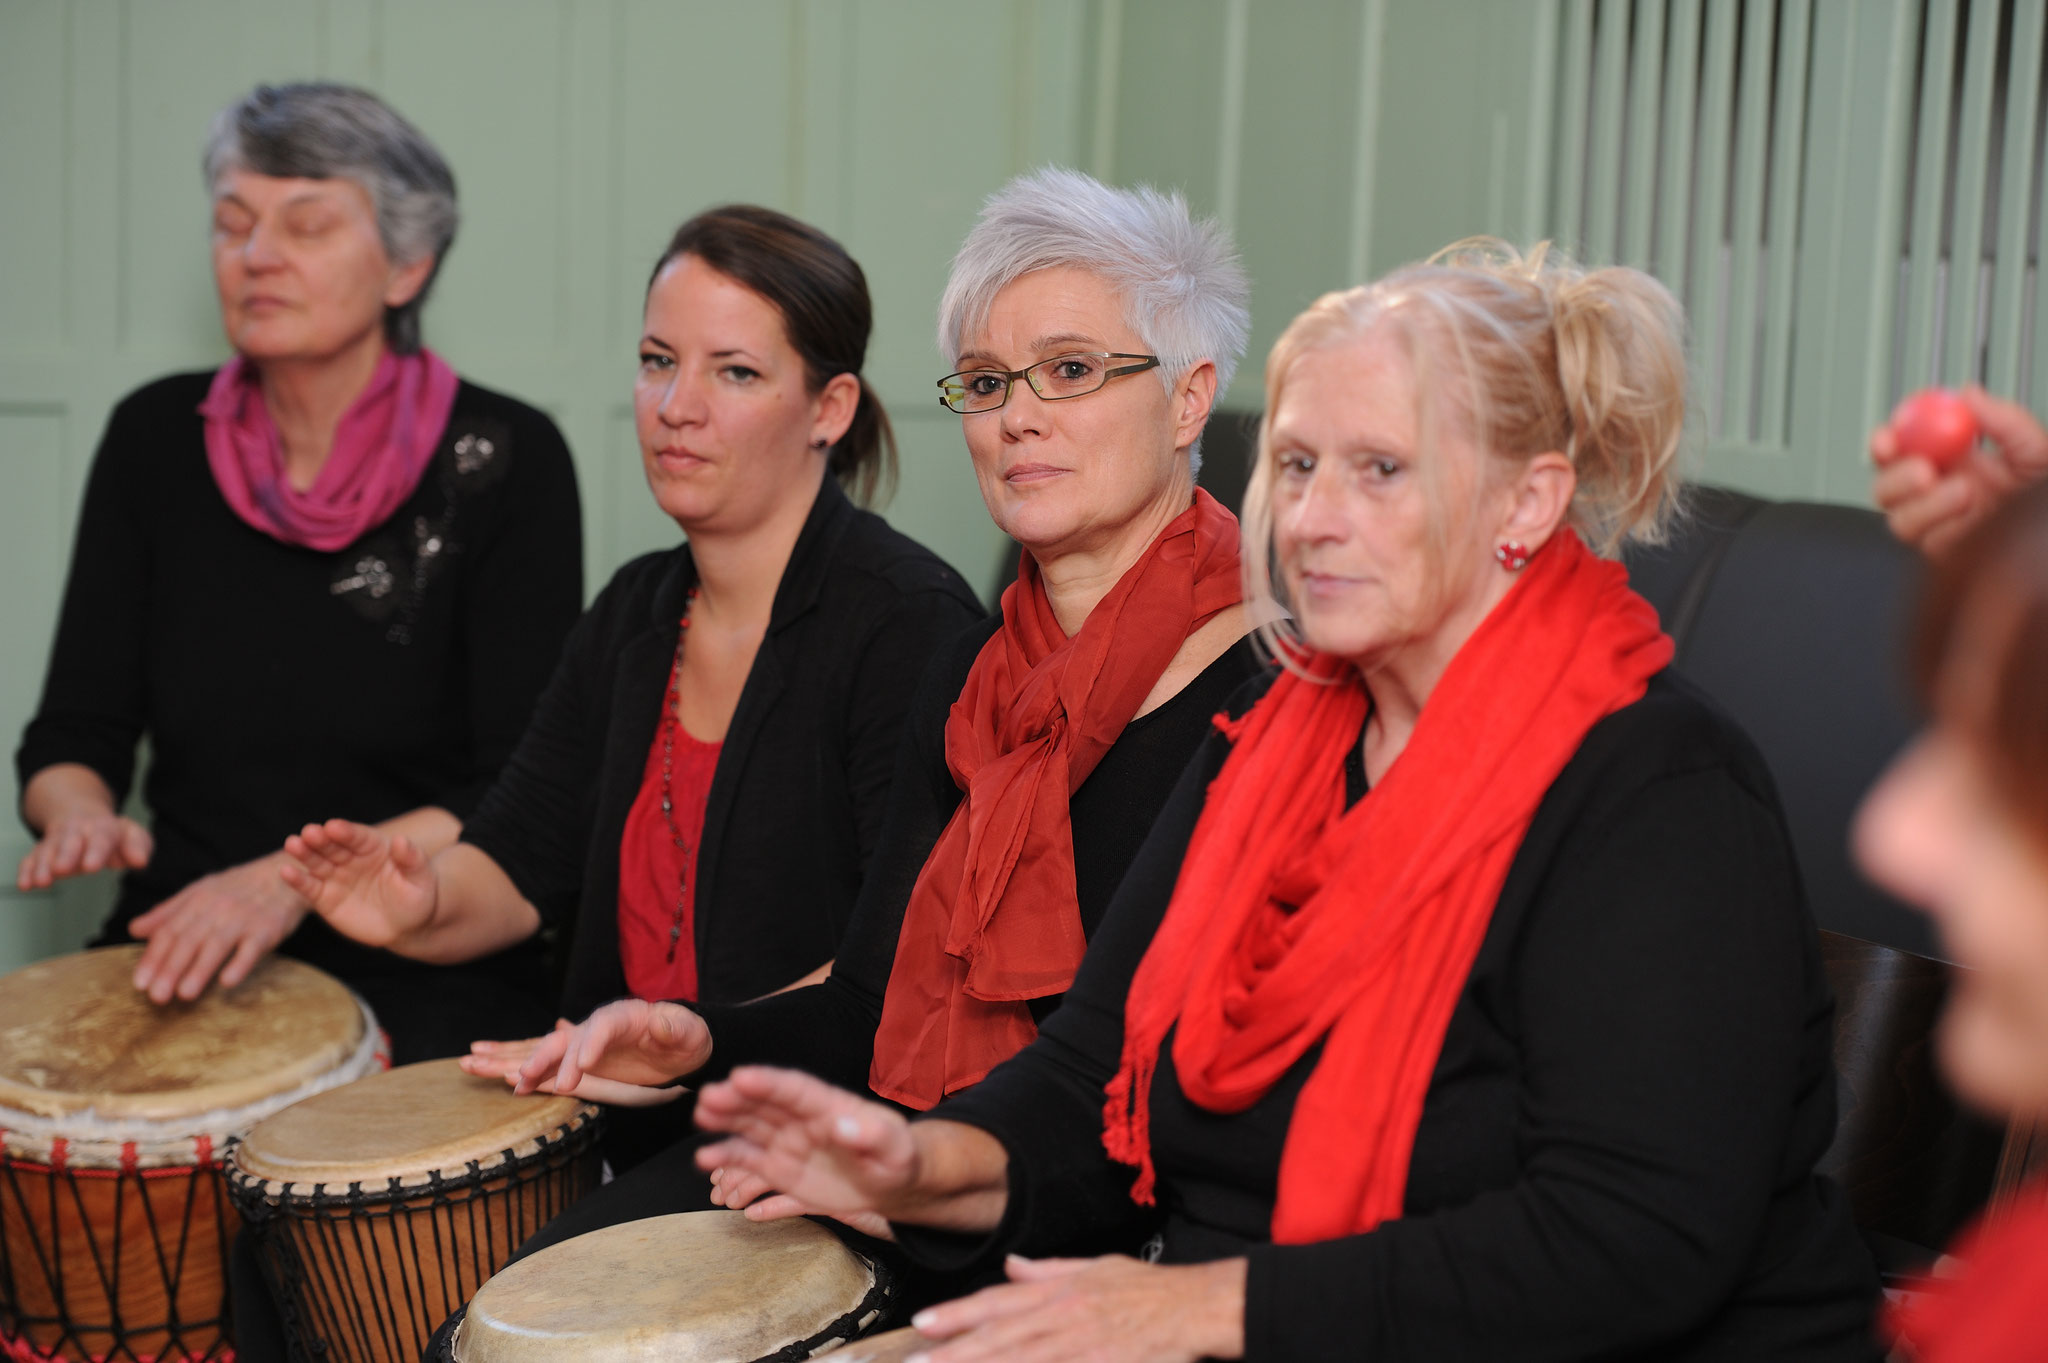 Auftritt Gruppe Percussion